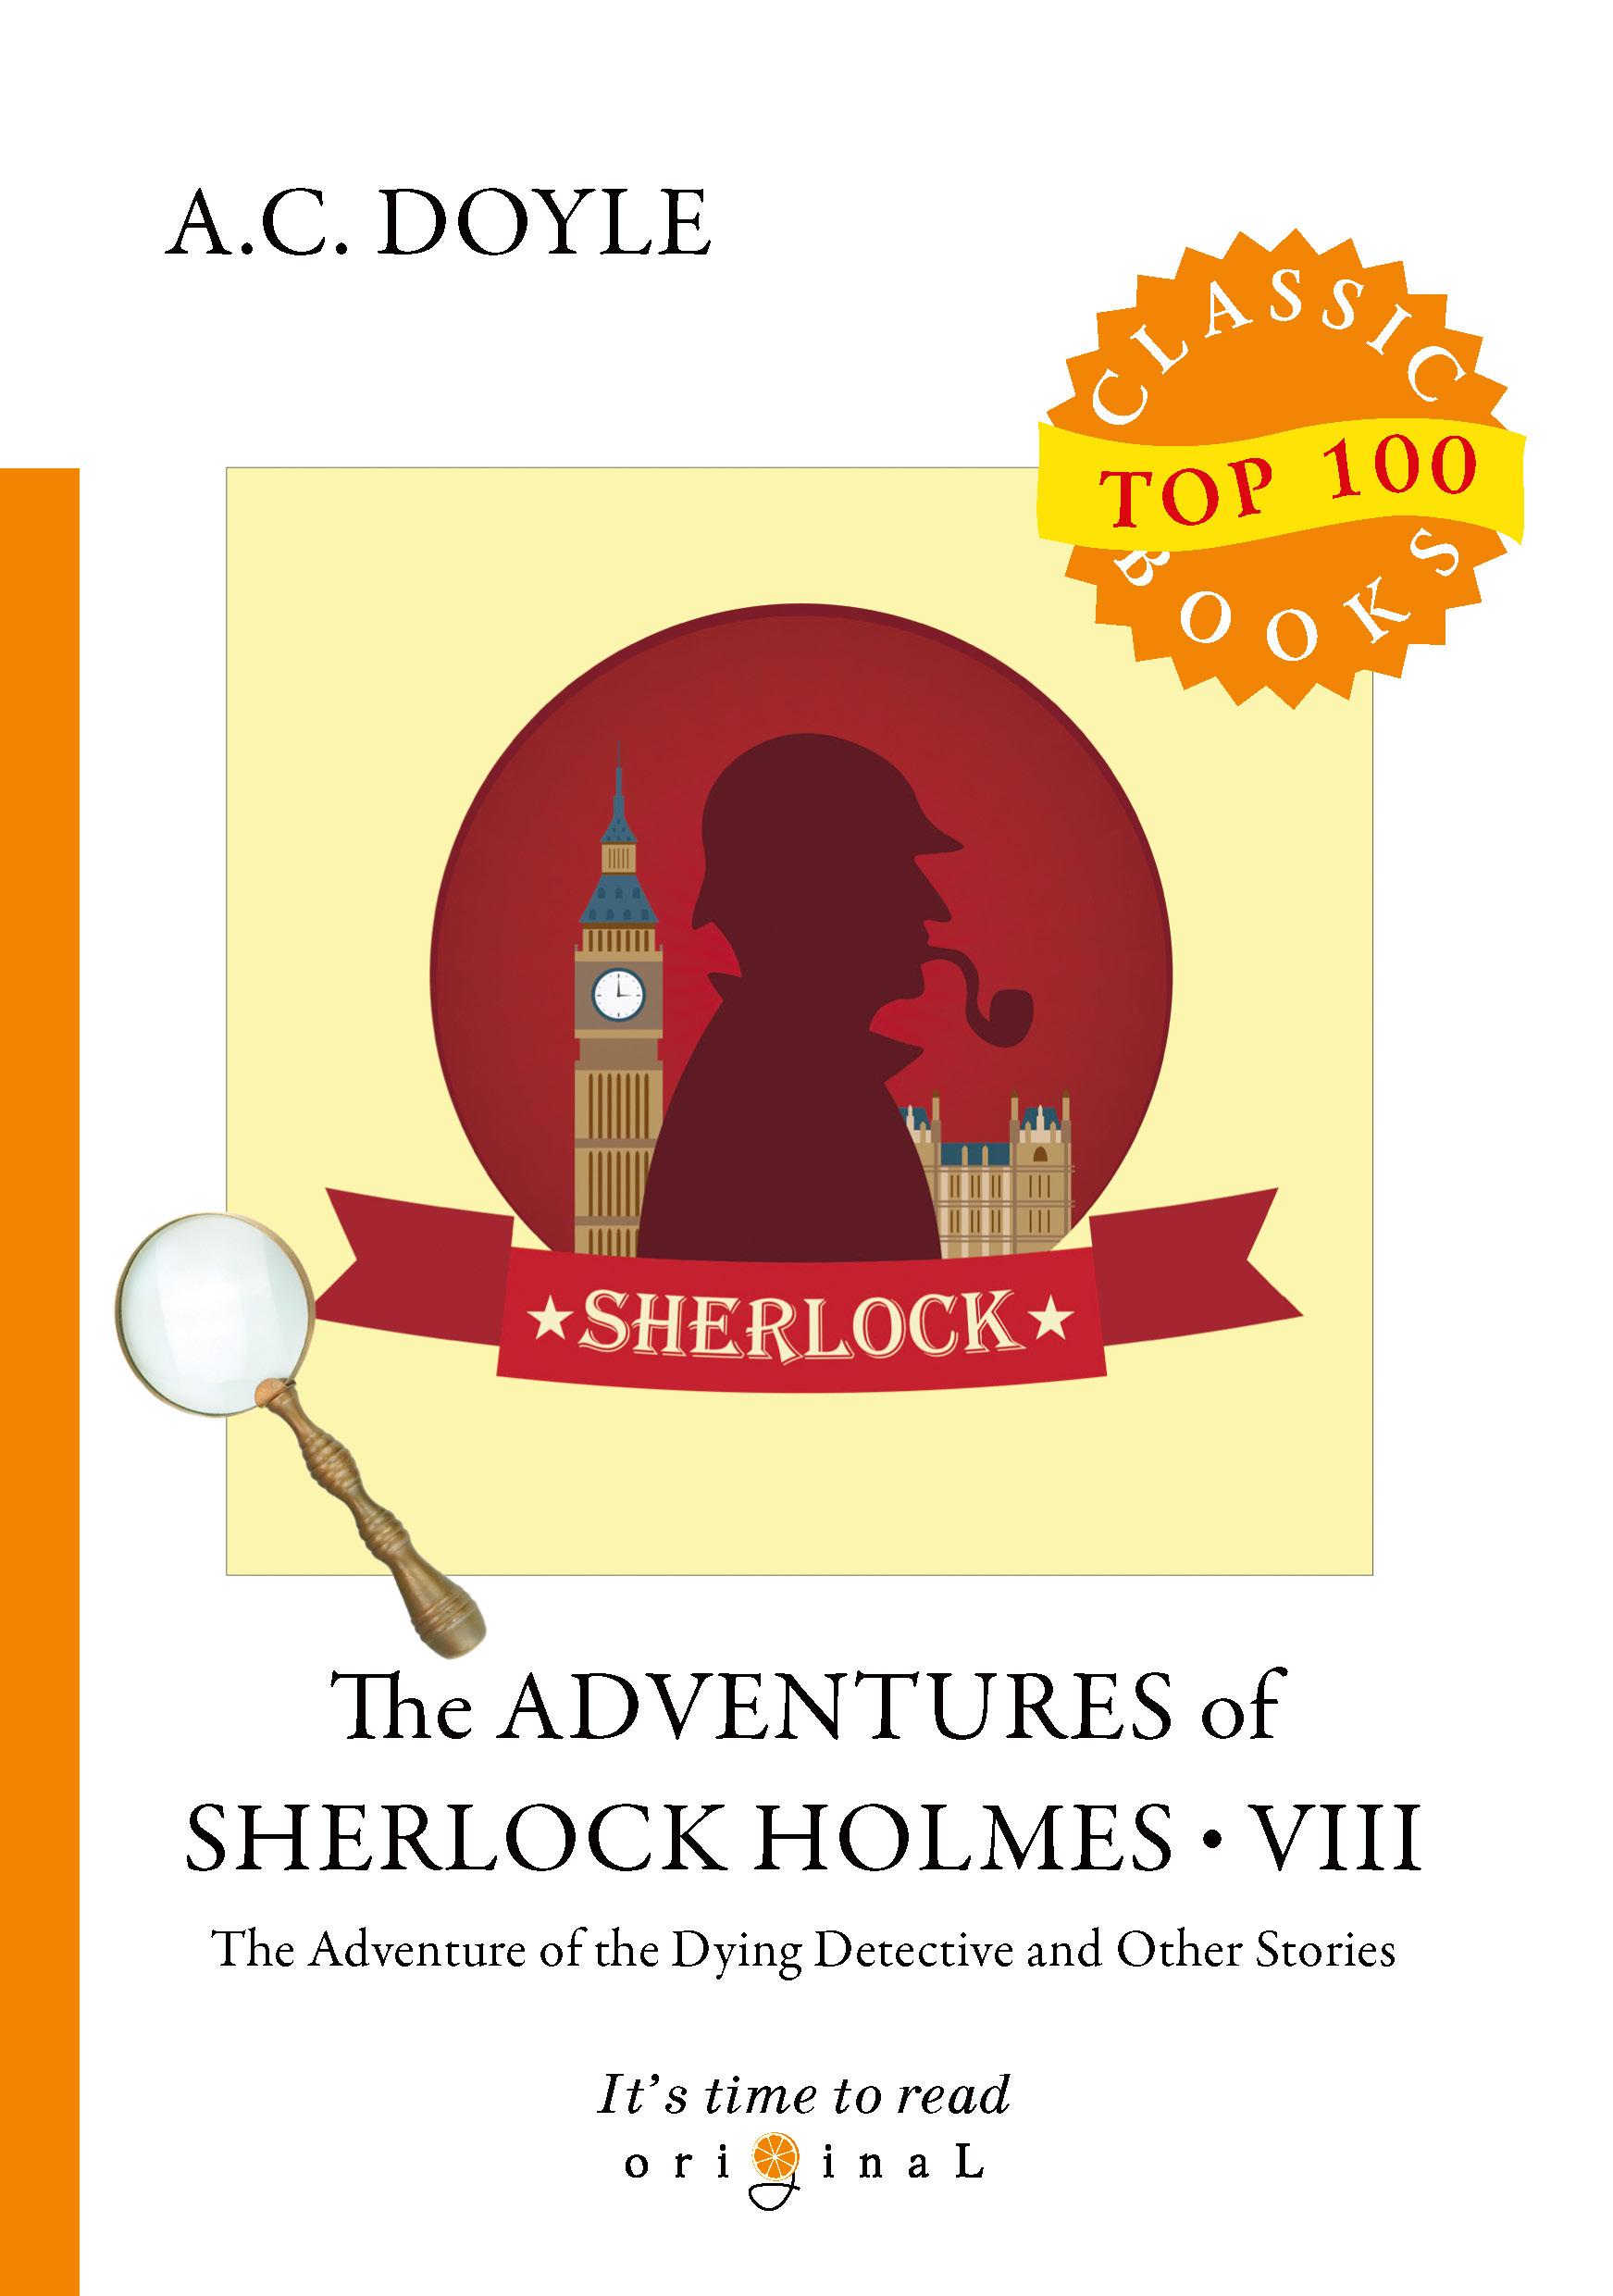 A. C. Doyle The Adventures of Sherlock Holmes VIII